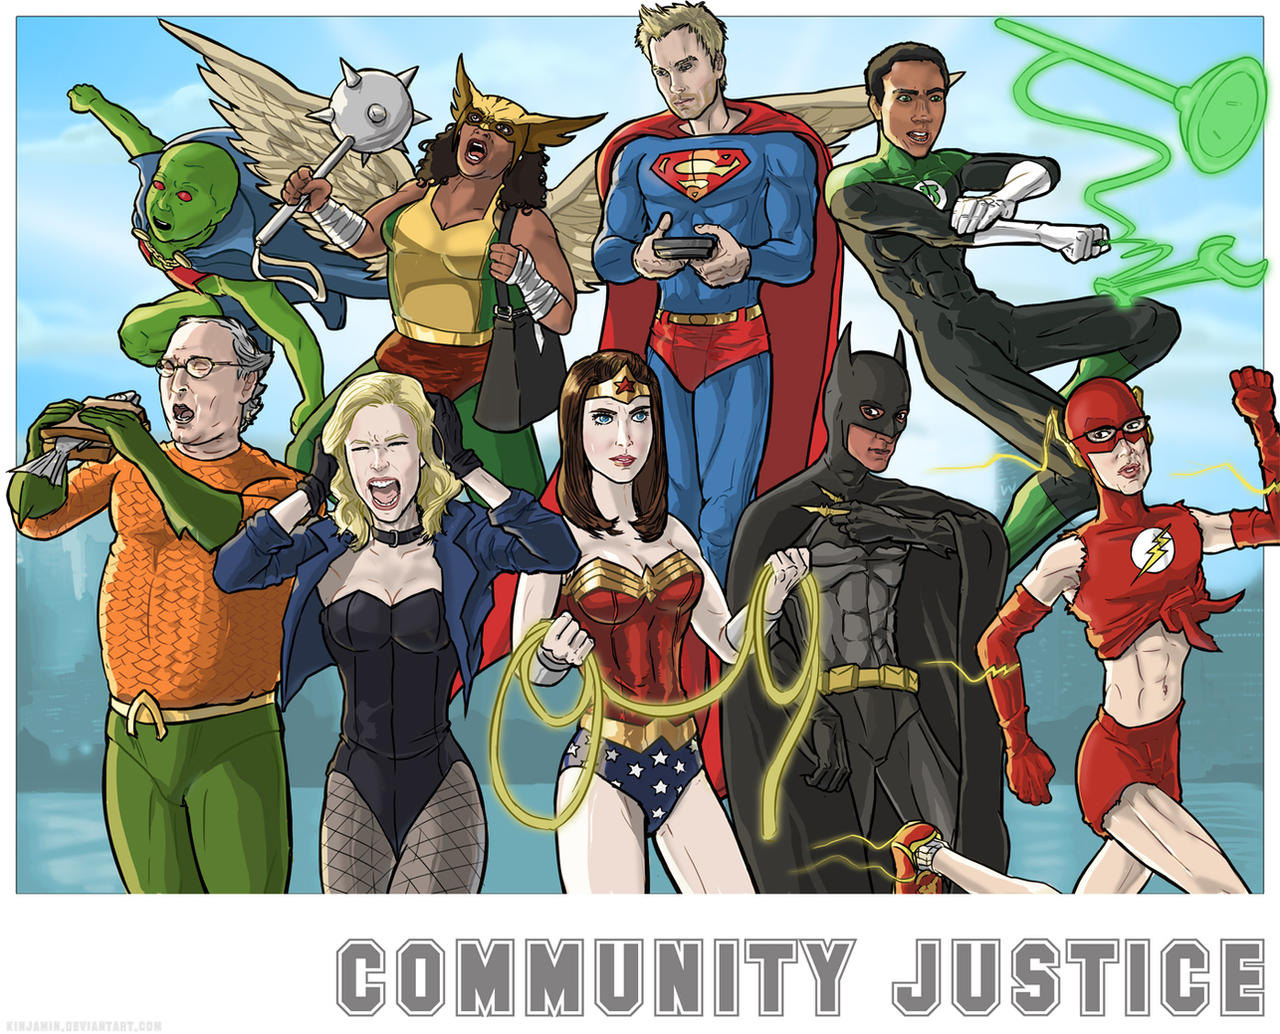 Community Justice by kinjamin